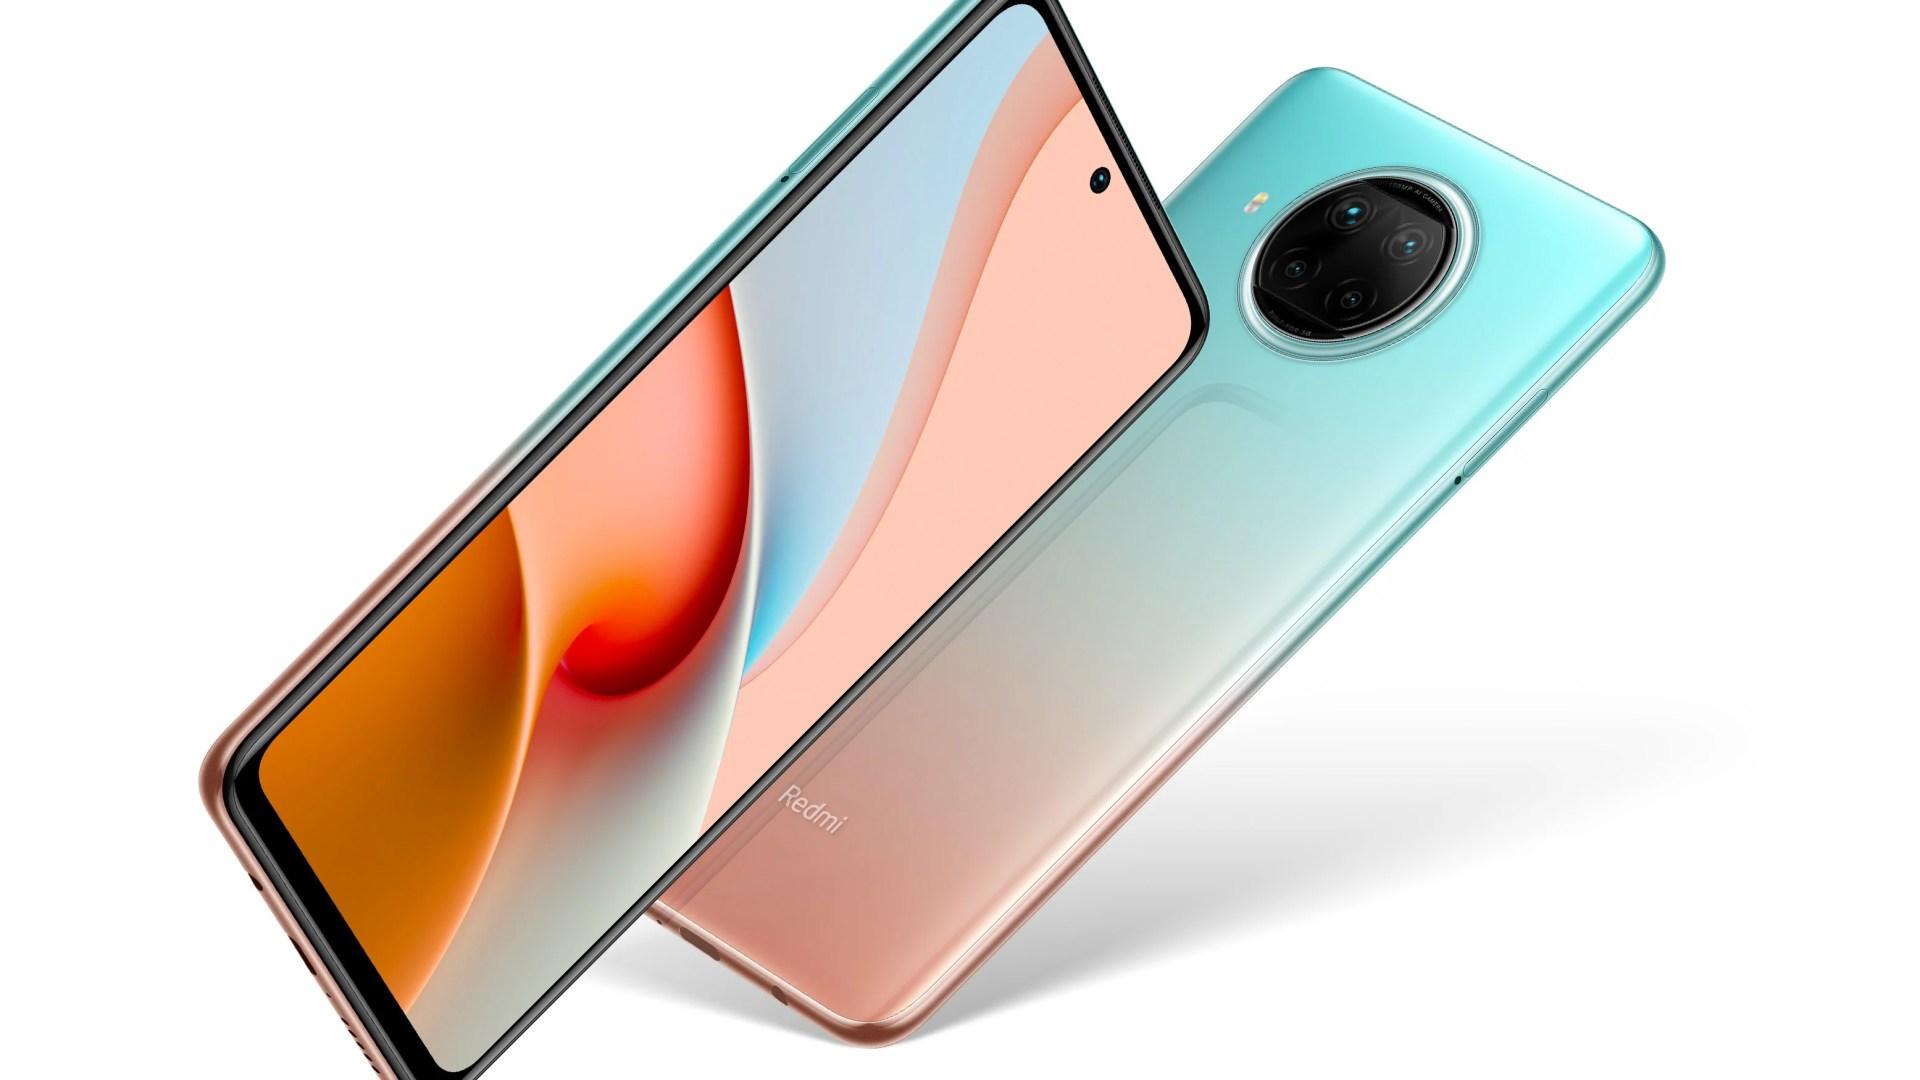 Smartphone, Samsung, Kamera, Octacore, Xiaomi, 5G, MIUI, HM2, Xiaomi Mi 10i, Qualcomm Snapdragon 750G, Samsung ISOCELL HM2